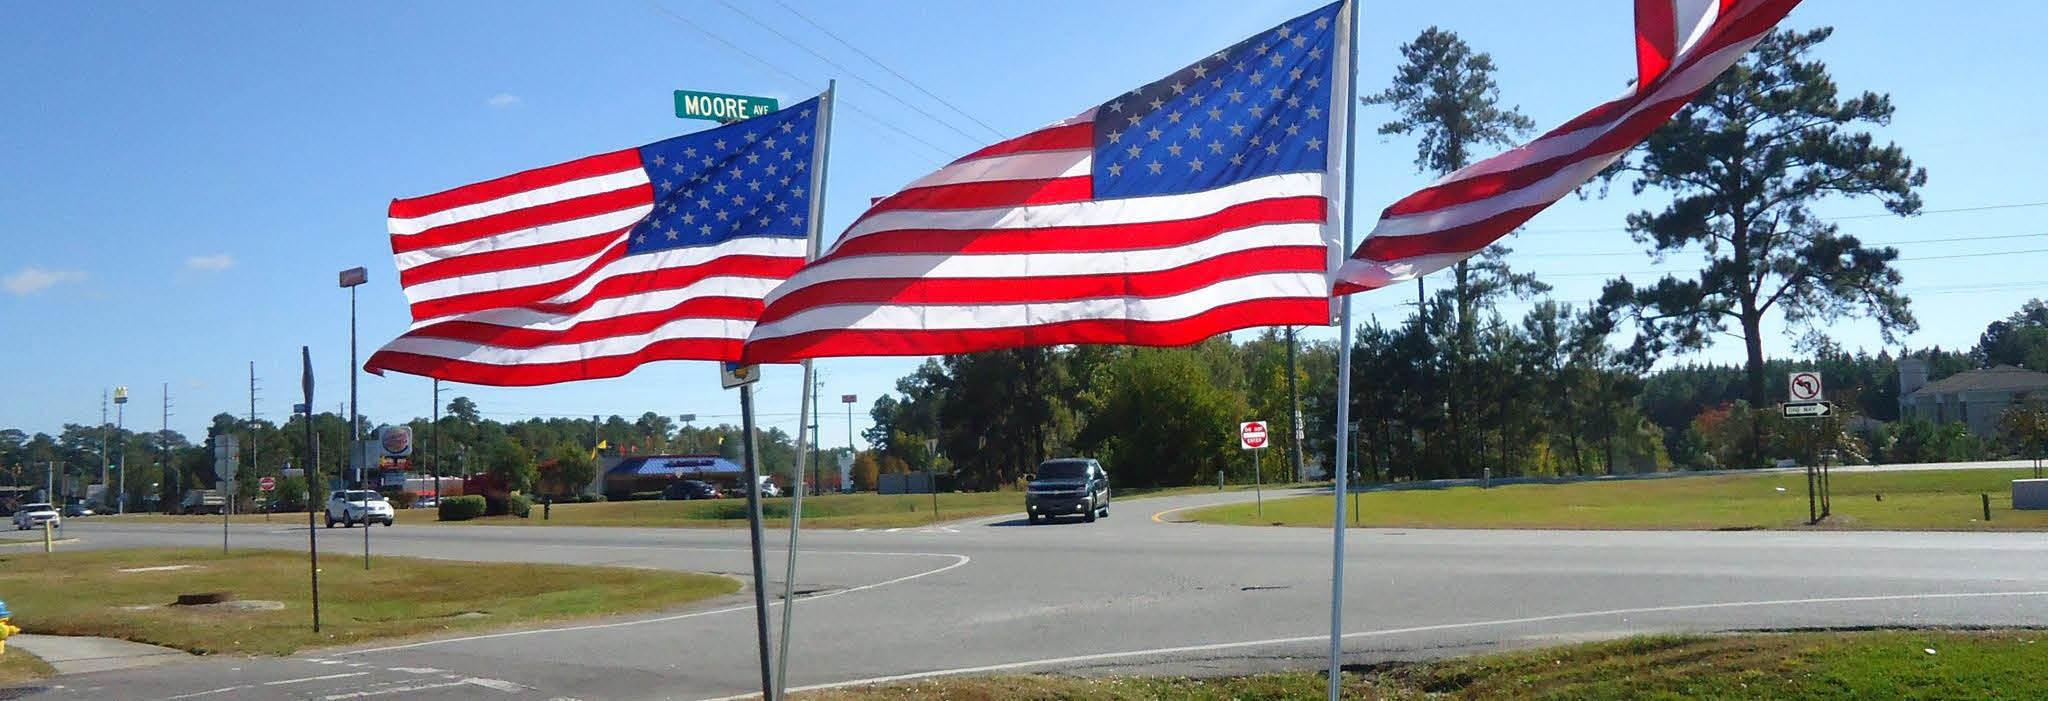 Pooler Lions Club American flags in Savannah GA banner ad